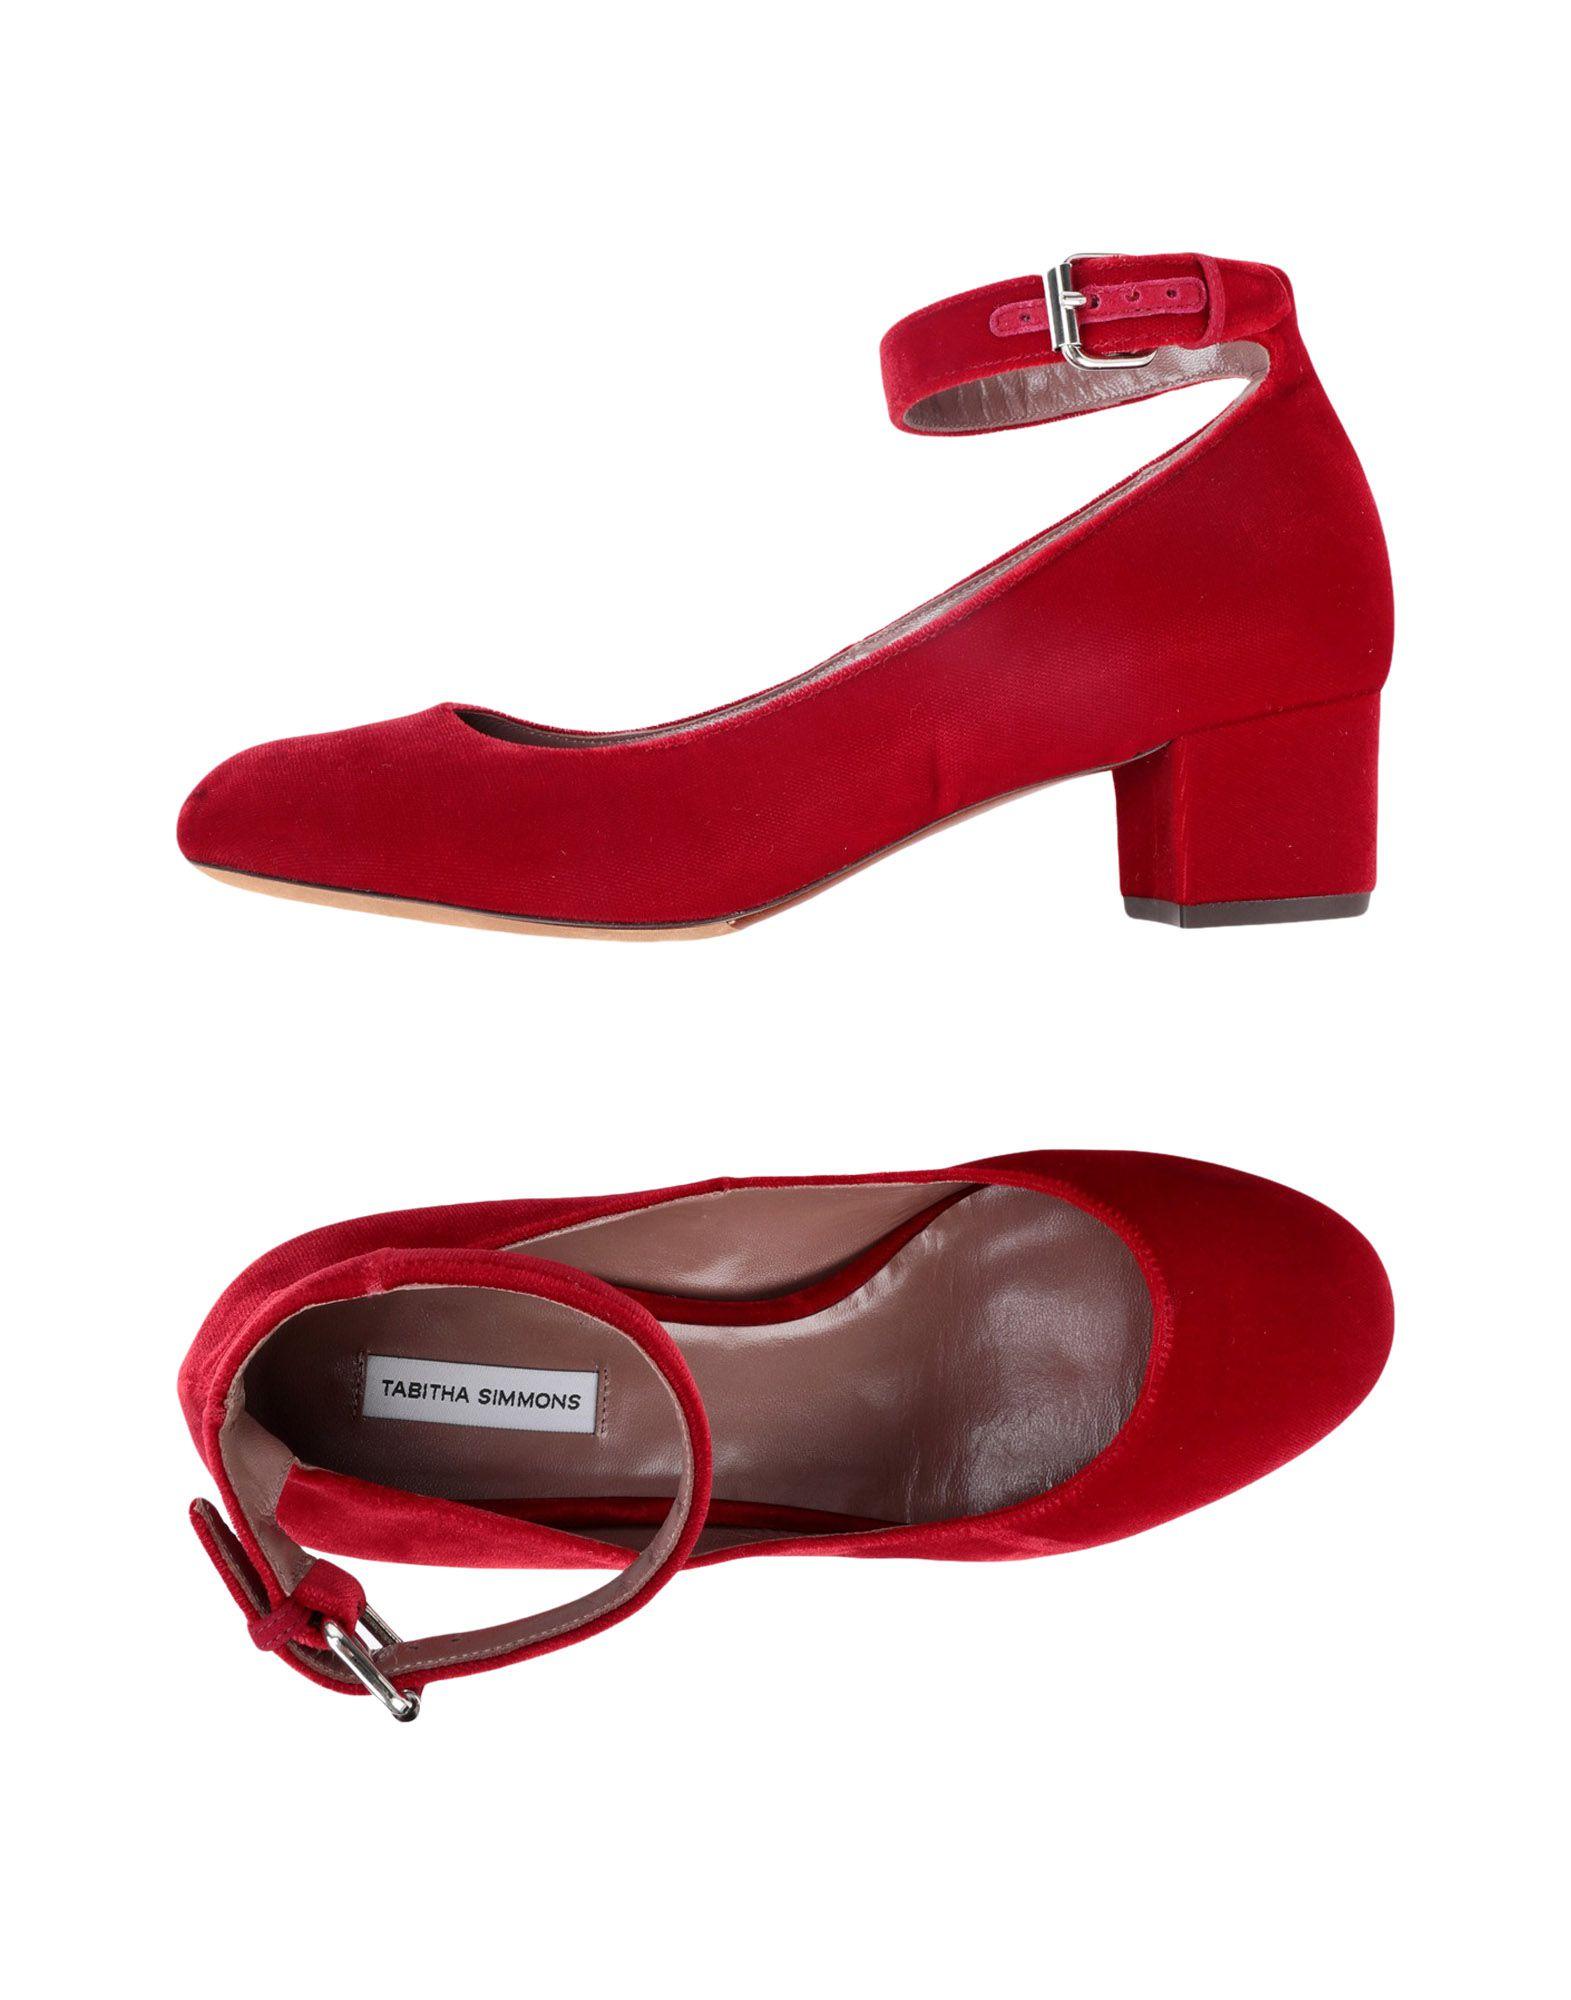 Escarpins Tabitha Simmons Femme - Escarpins Tabitha Simmons Rouge Chaussures casual sauvages